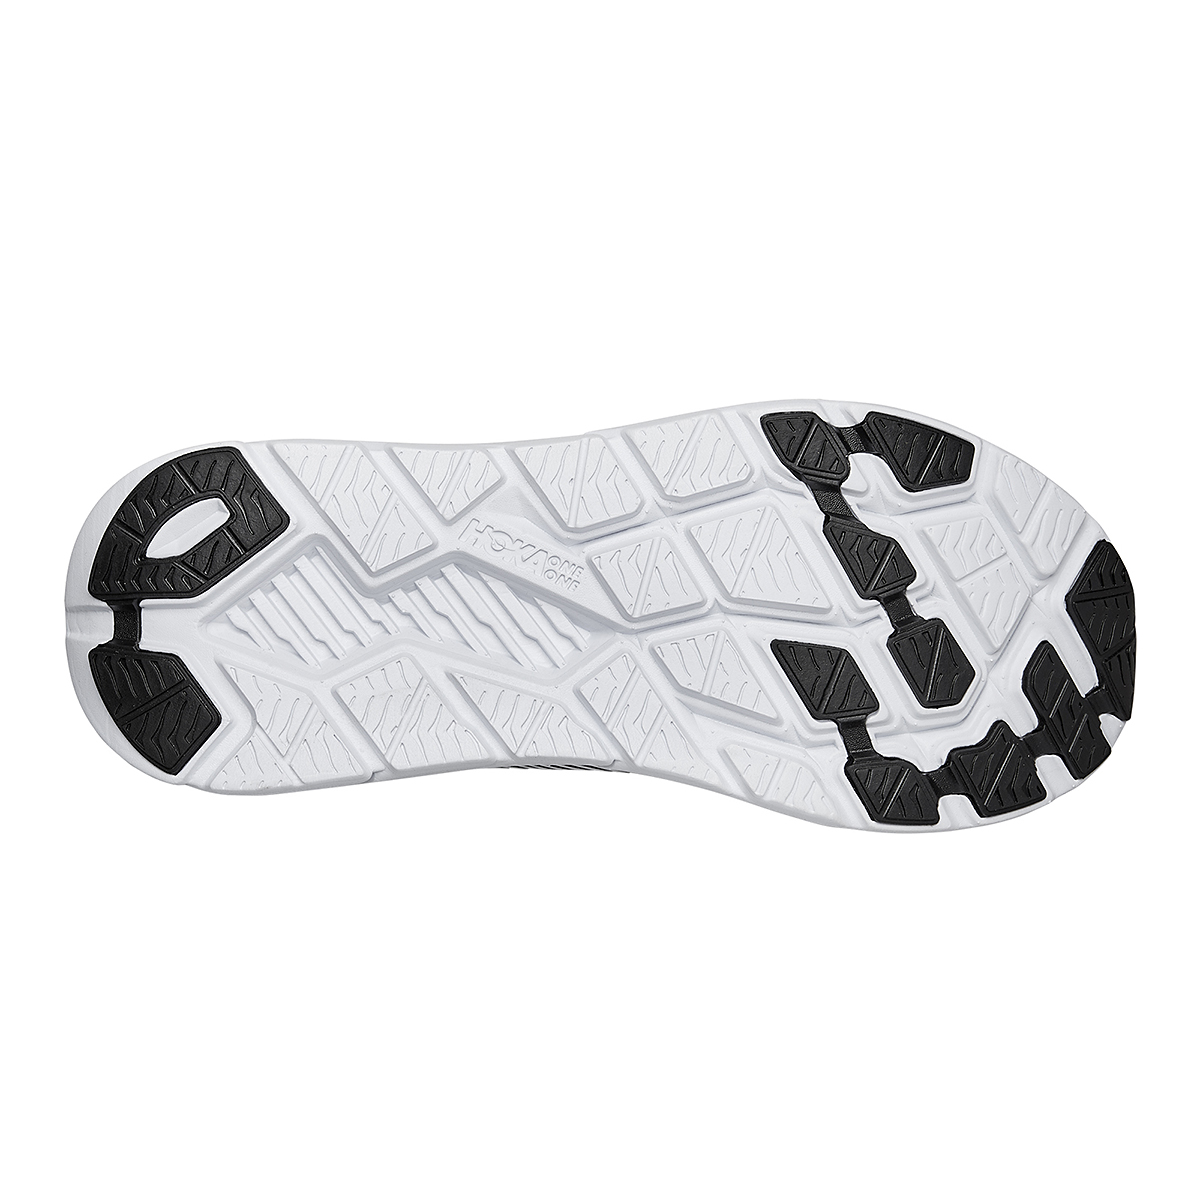 Men's Hoka One One Rincon 2 Running Shoe - Color: Black/White - Size: 8 - Width: Regular, Black/White, large, image 6